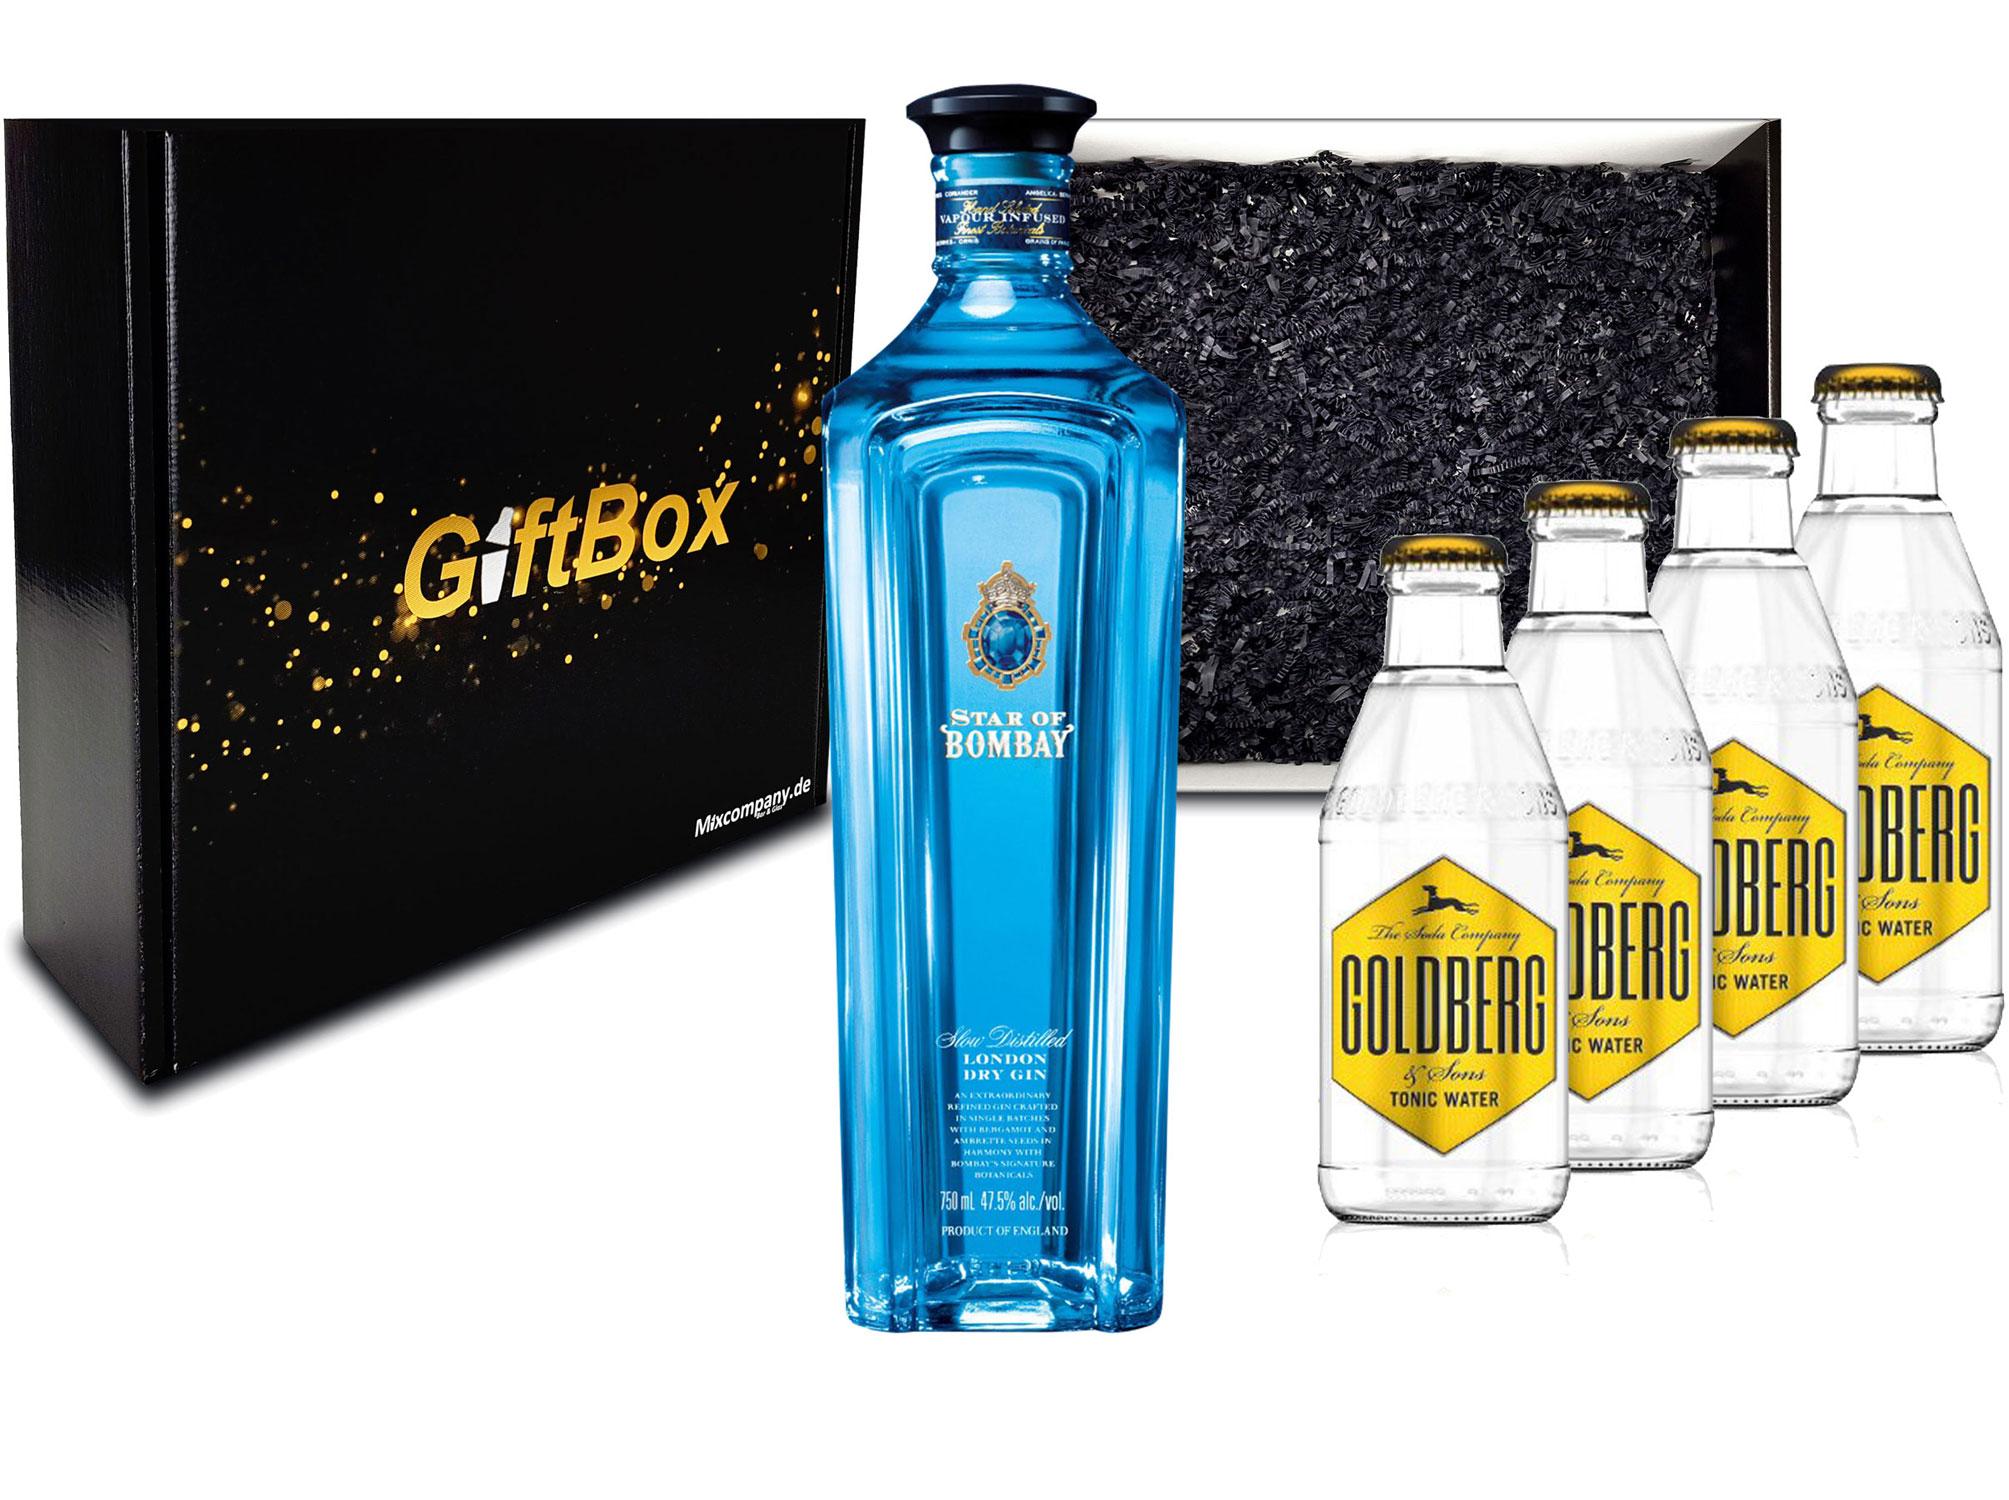 Gin Tonic Giftbox Geschenkset - Star of Bombay Slow Distilled London Dry Gin 0,7l (47,5% Vol) + 4x Goldberg Tonic Water 200ml inkl. Pfand MEHRWEG - [Enthält Sulfite]